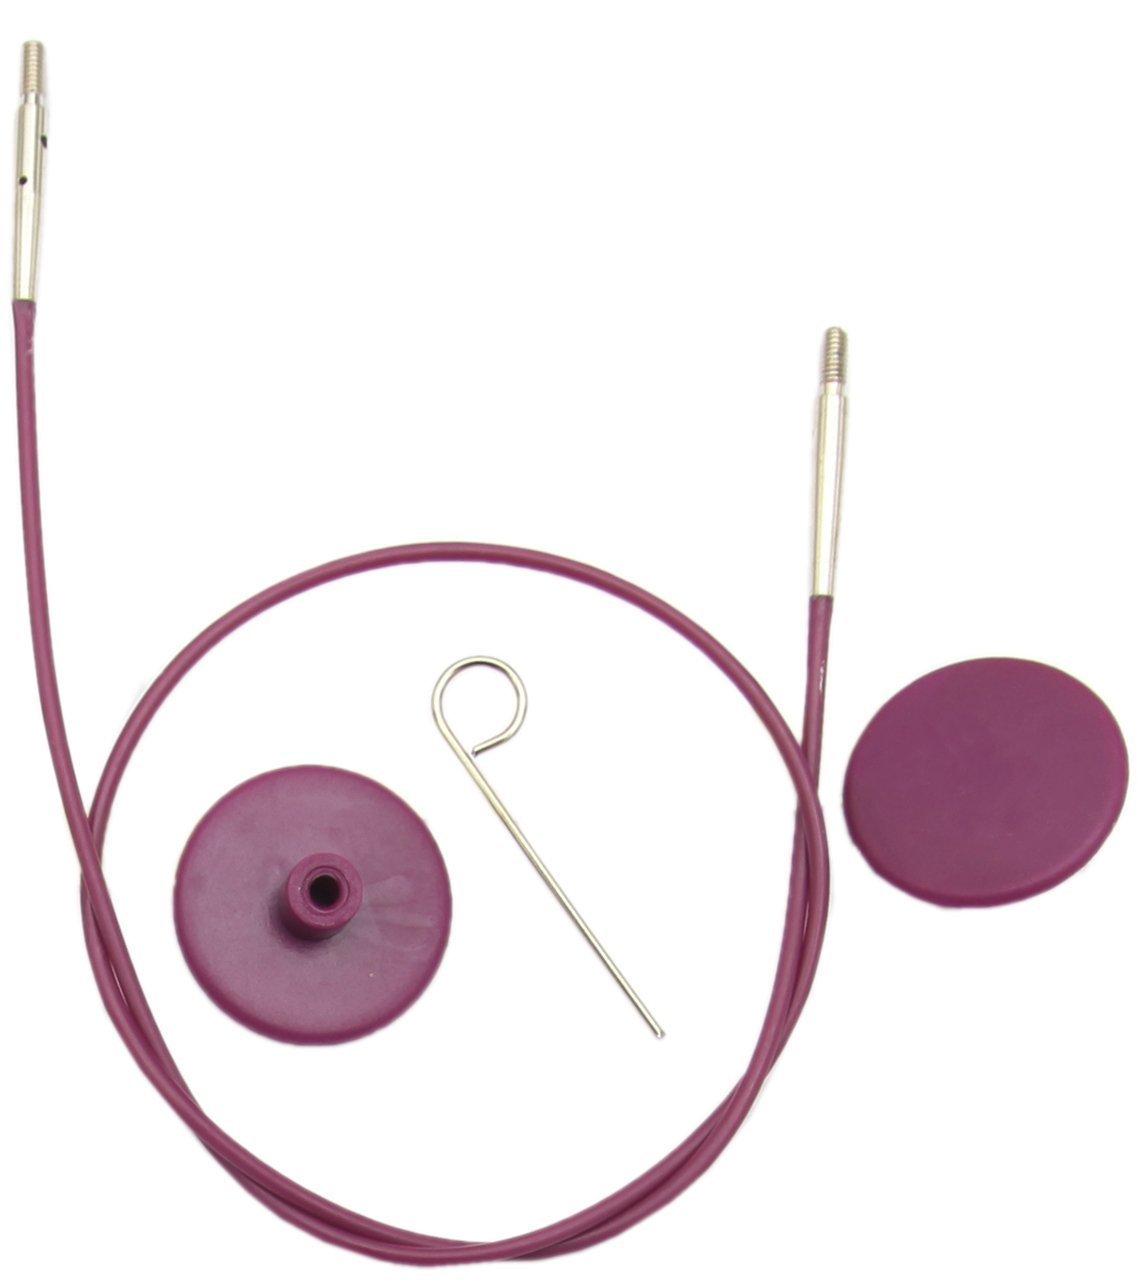 KnitPro Леска сменная Purple Silver 60 см 10501